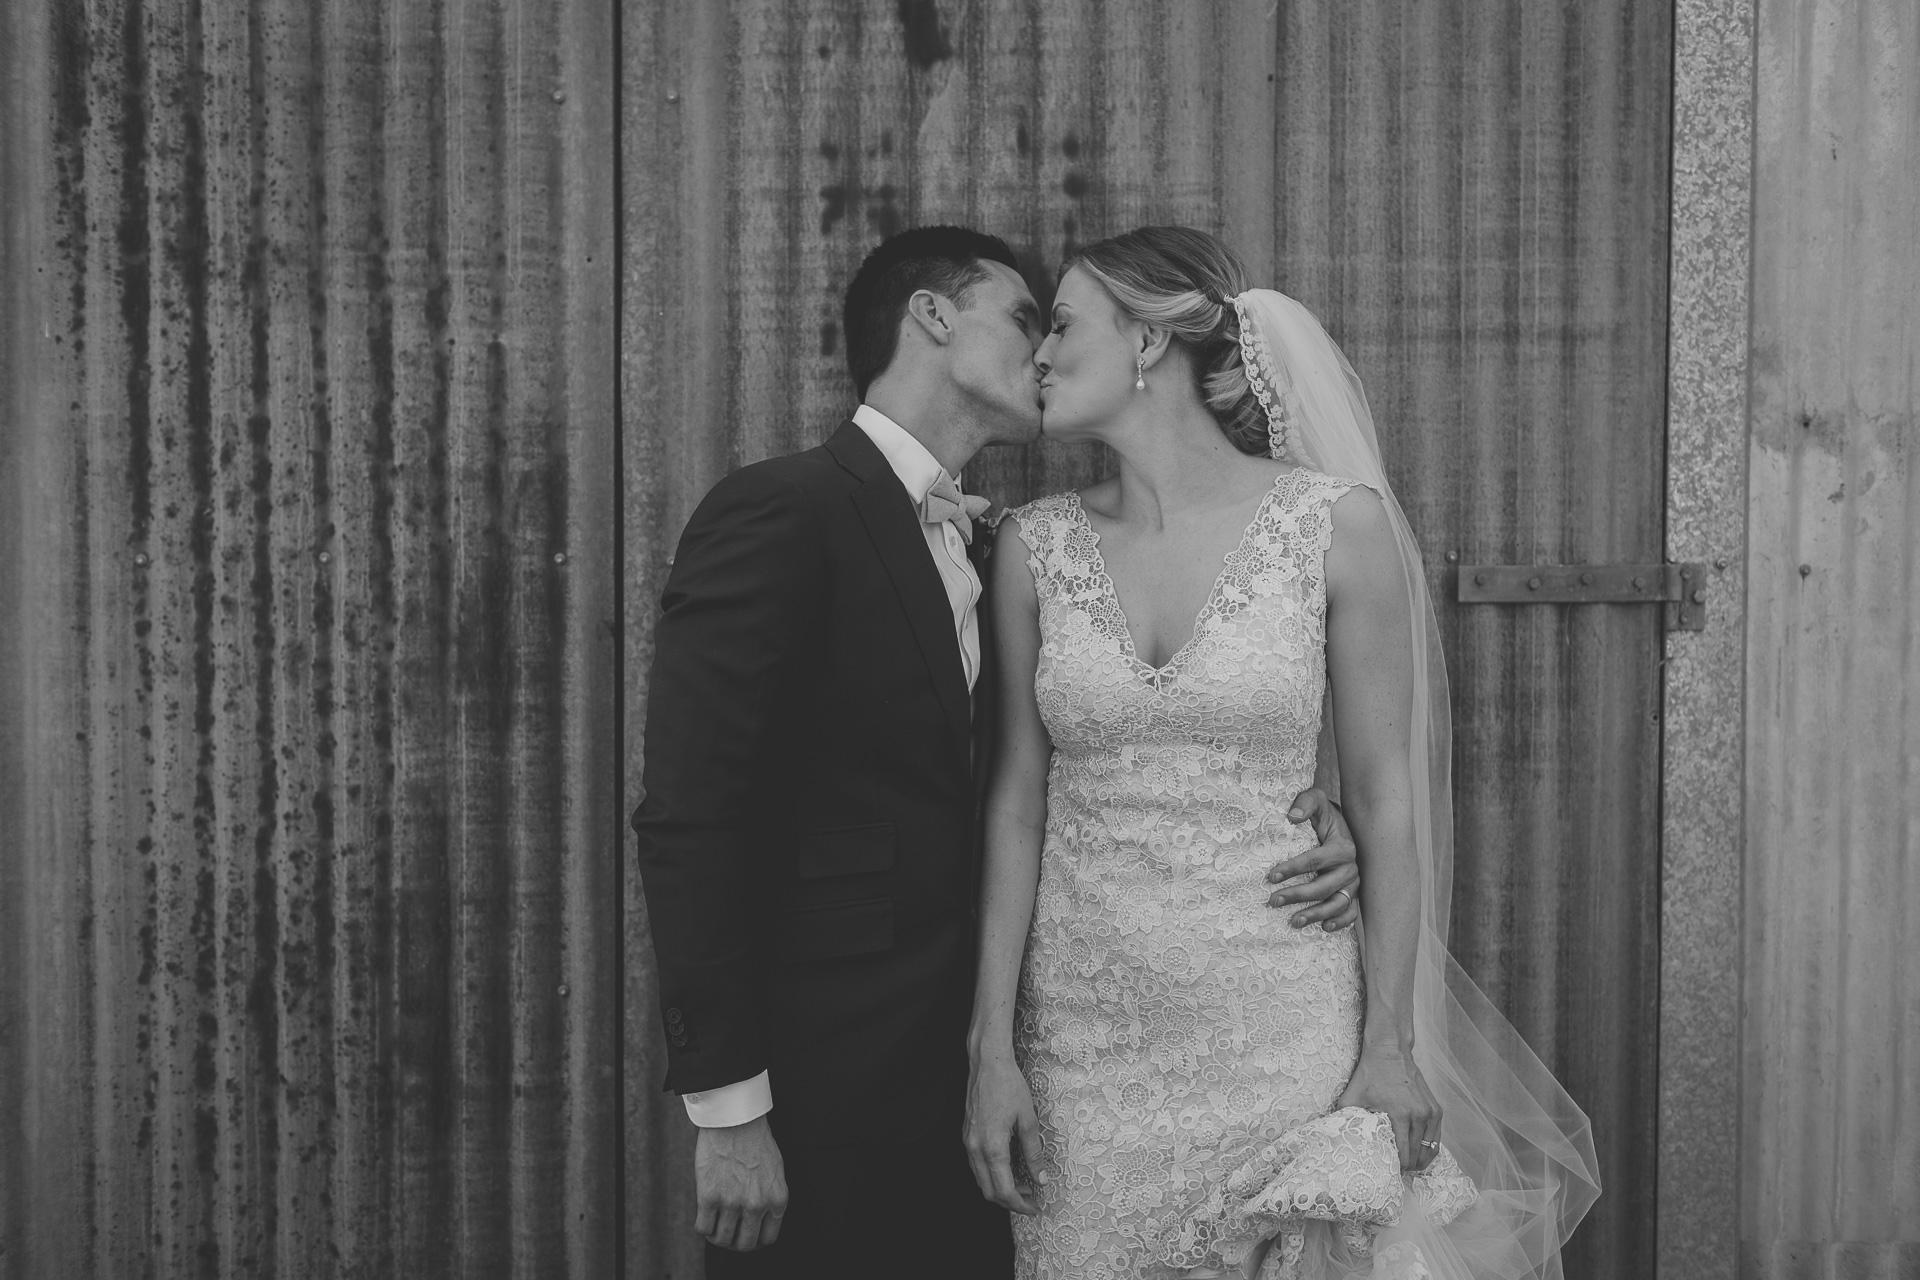 20161112 - Heath_Ruth_Wombat_Hollow_Wedding | 310-2.jpg